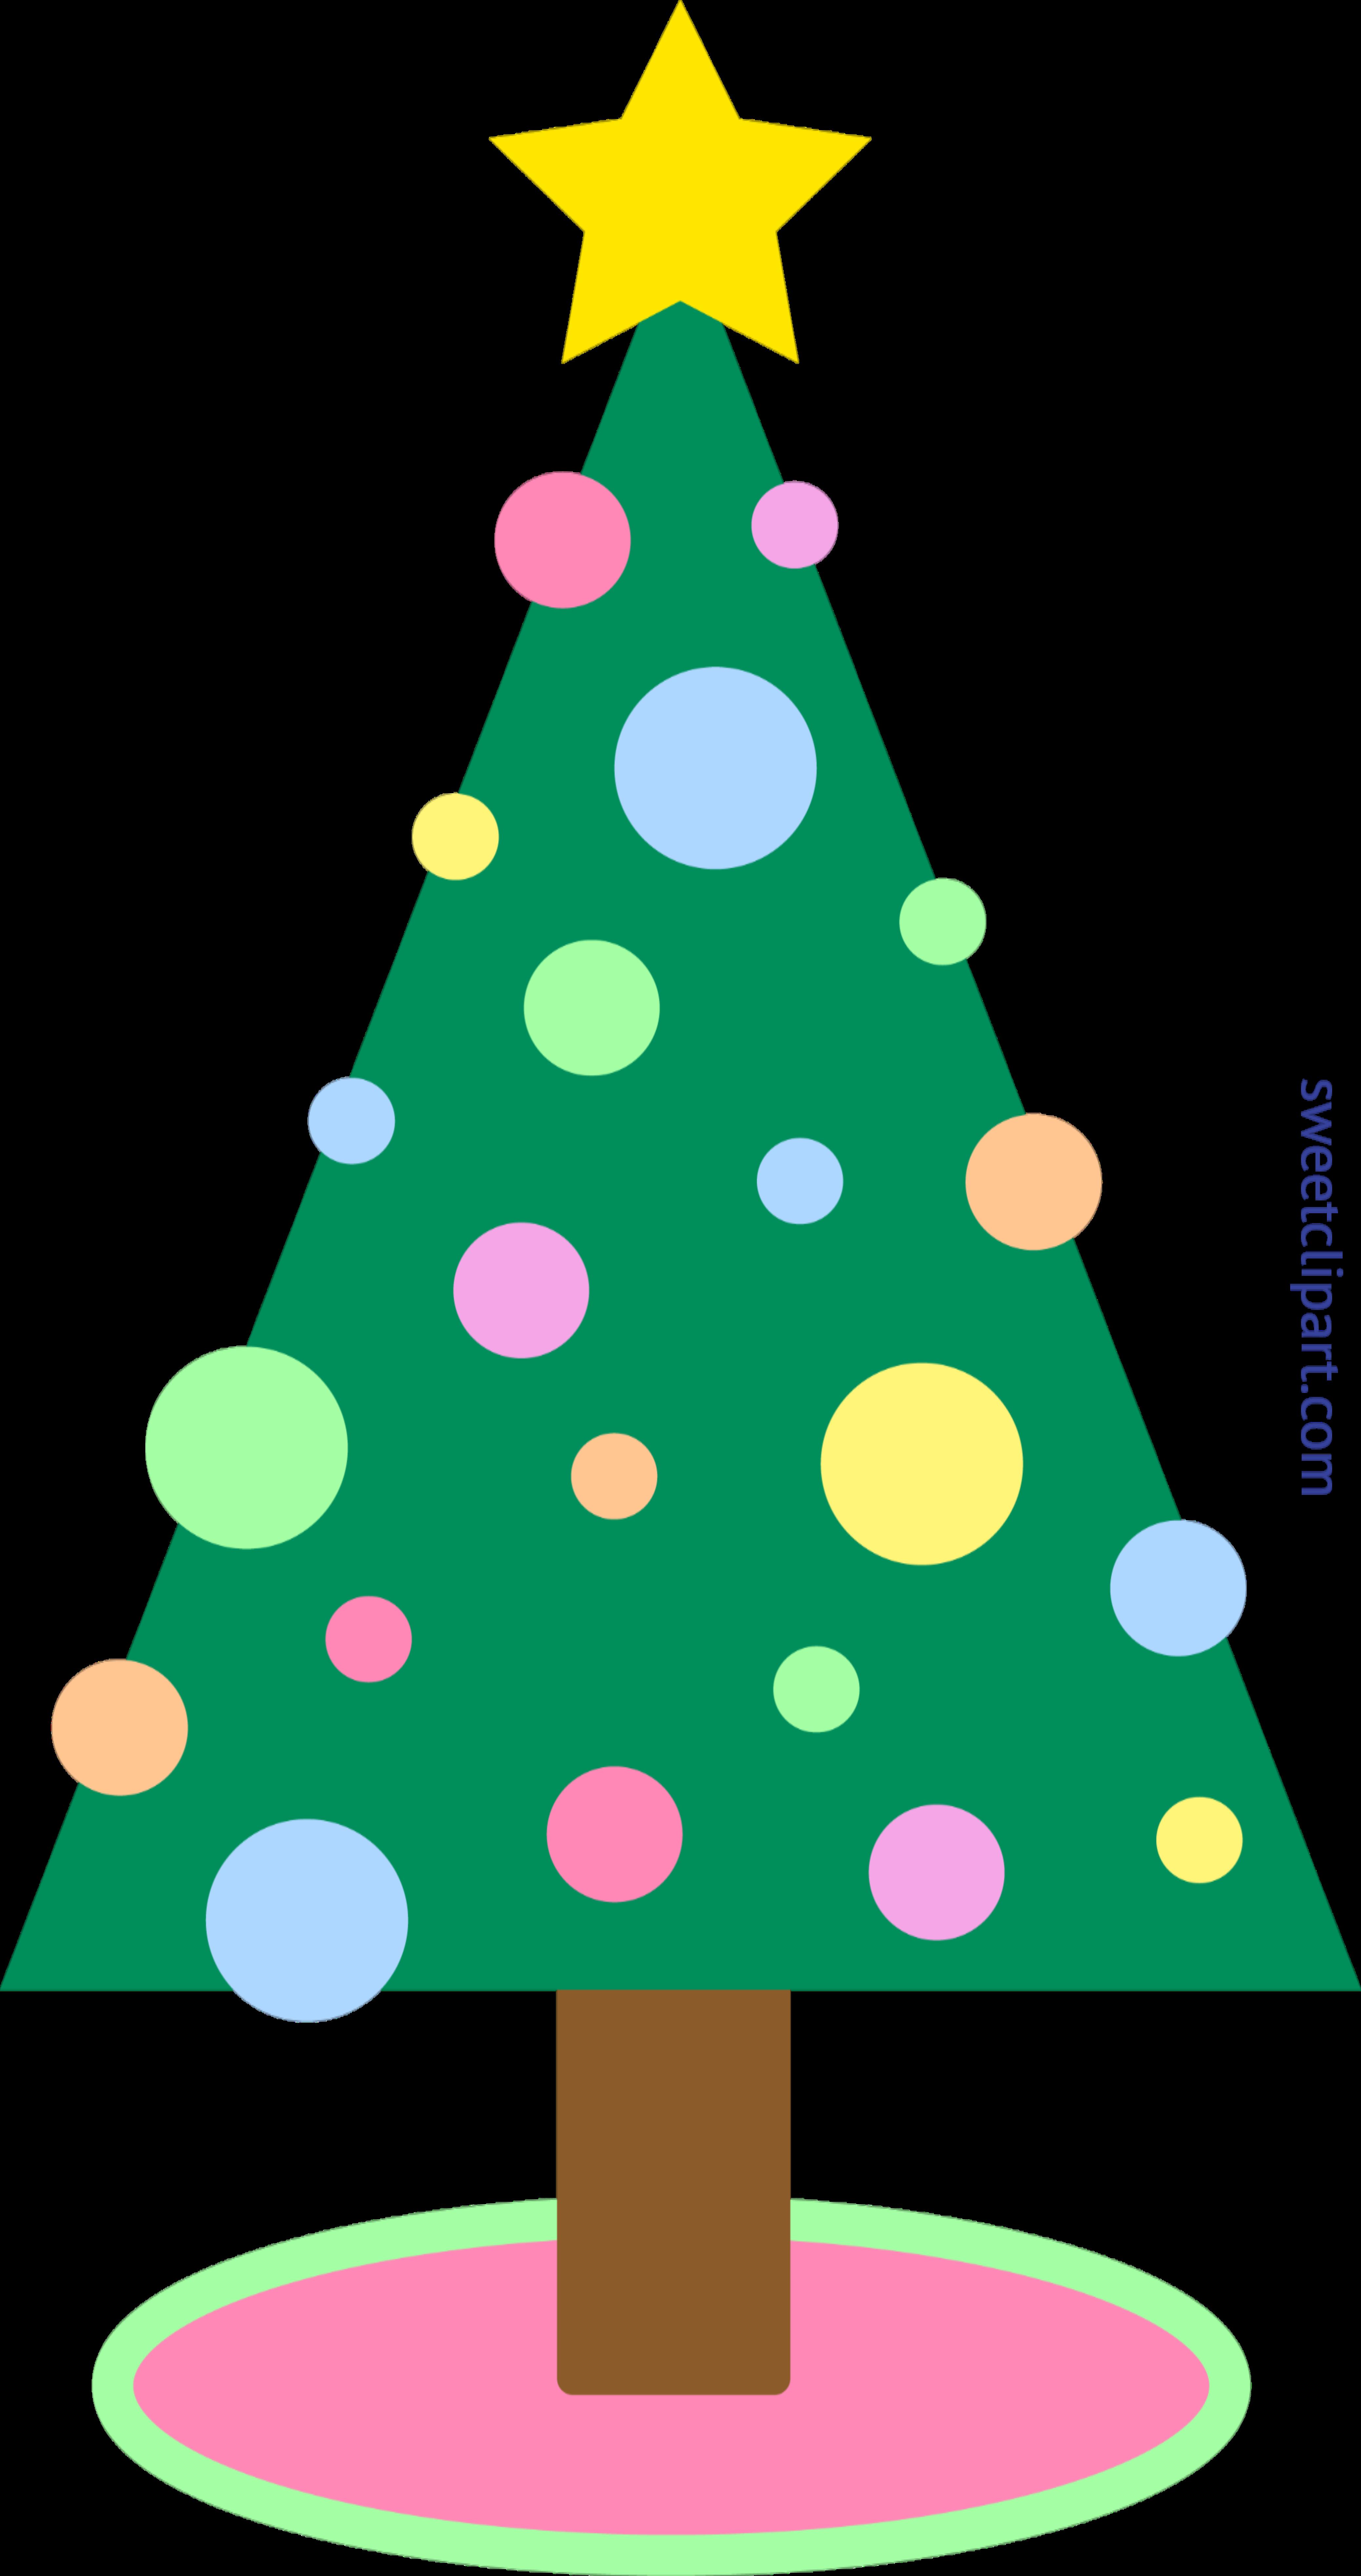 4150x7856 Holidays Christmas Tree Simple Pastel Clip Art